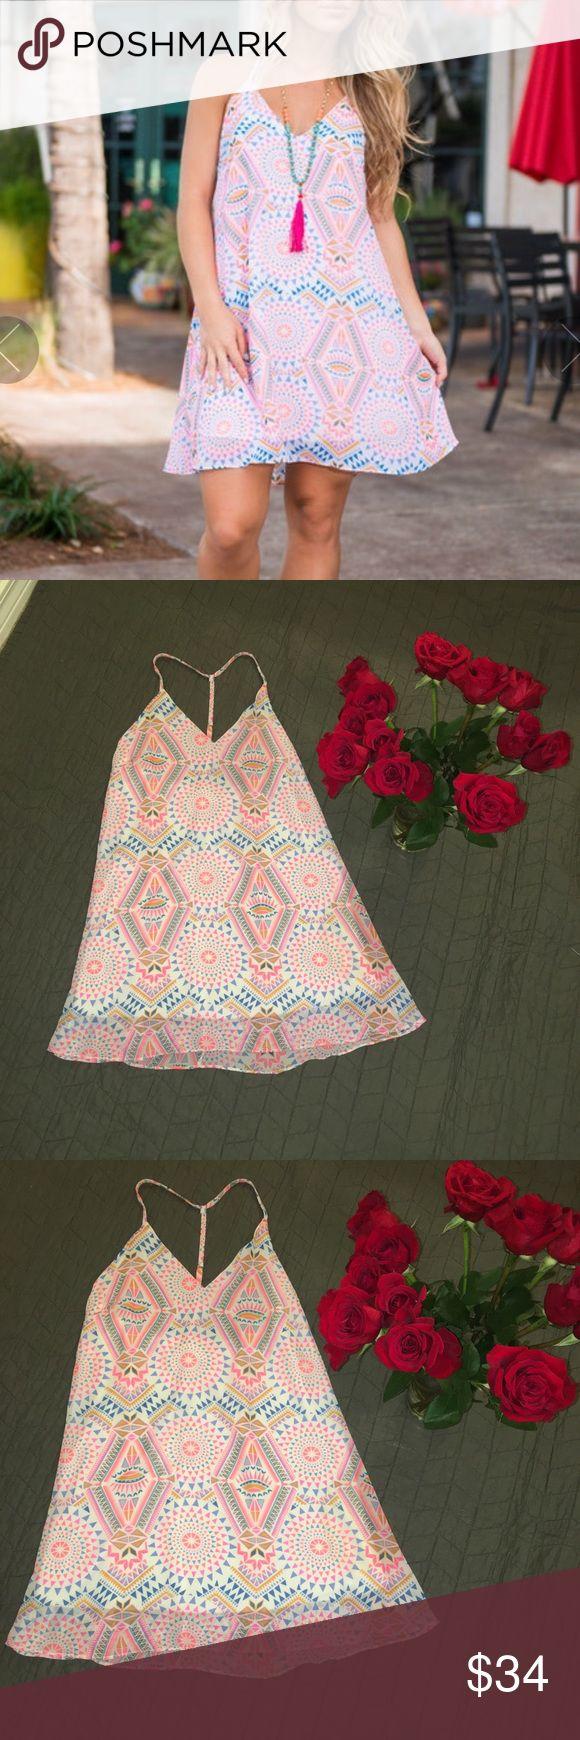 New Mint Julep Boutique Small Aztec print dress NWOT mint Julep Boutique size small Aztec print dress Mint Juelp Boutique Dresses Mini